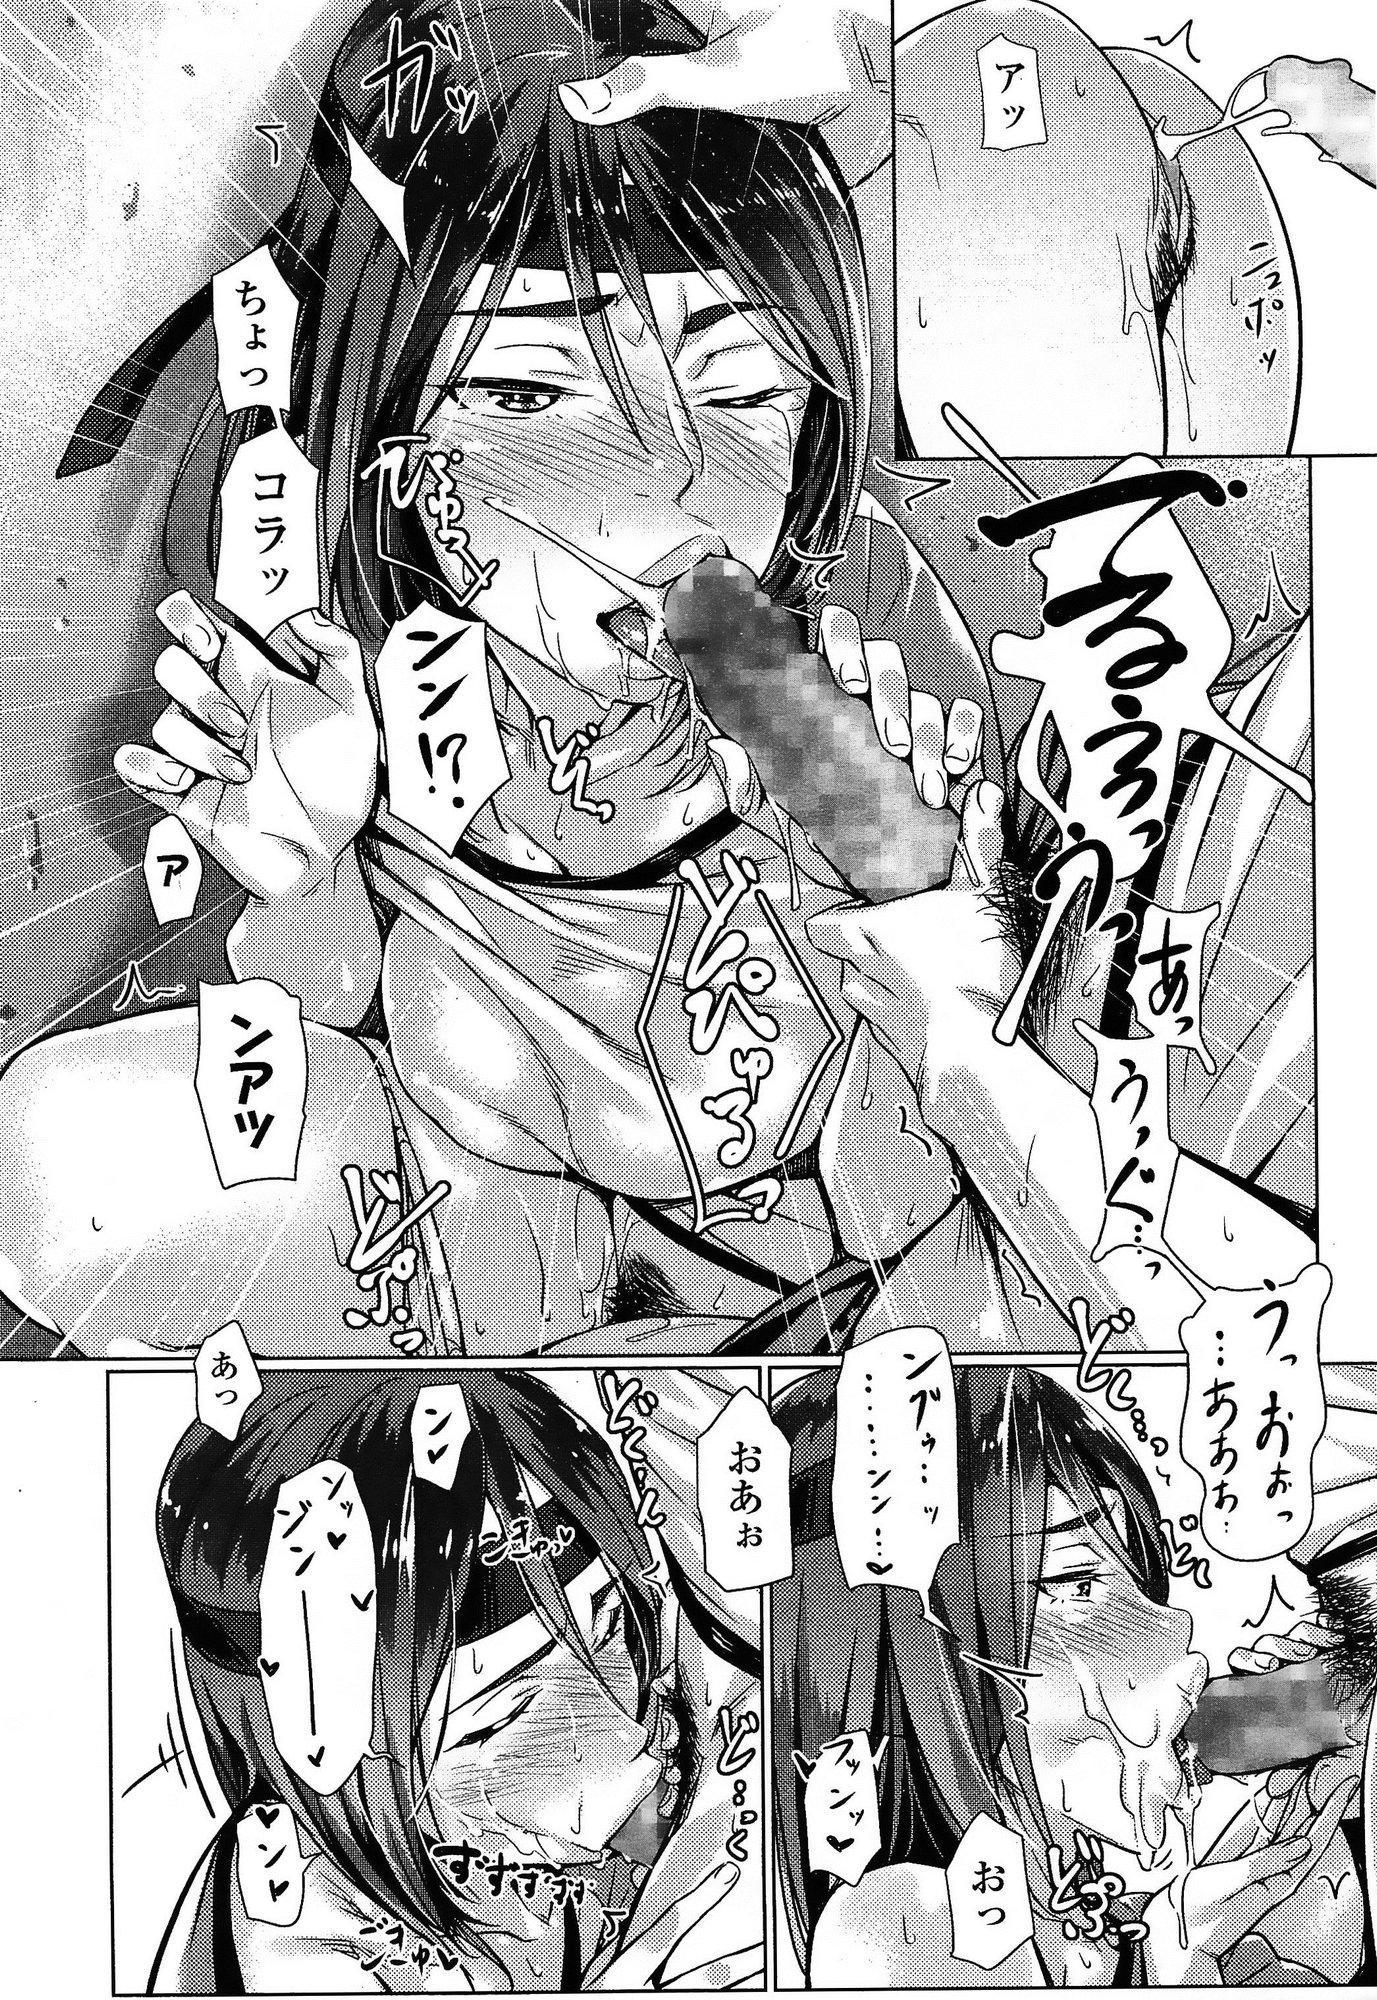 Comic Koh Vol.3 59